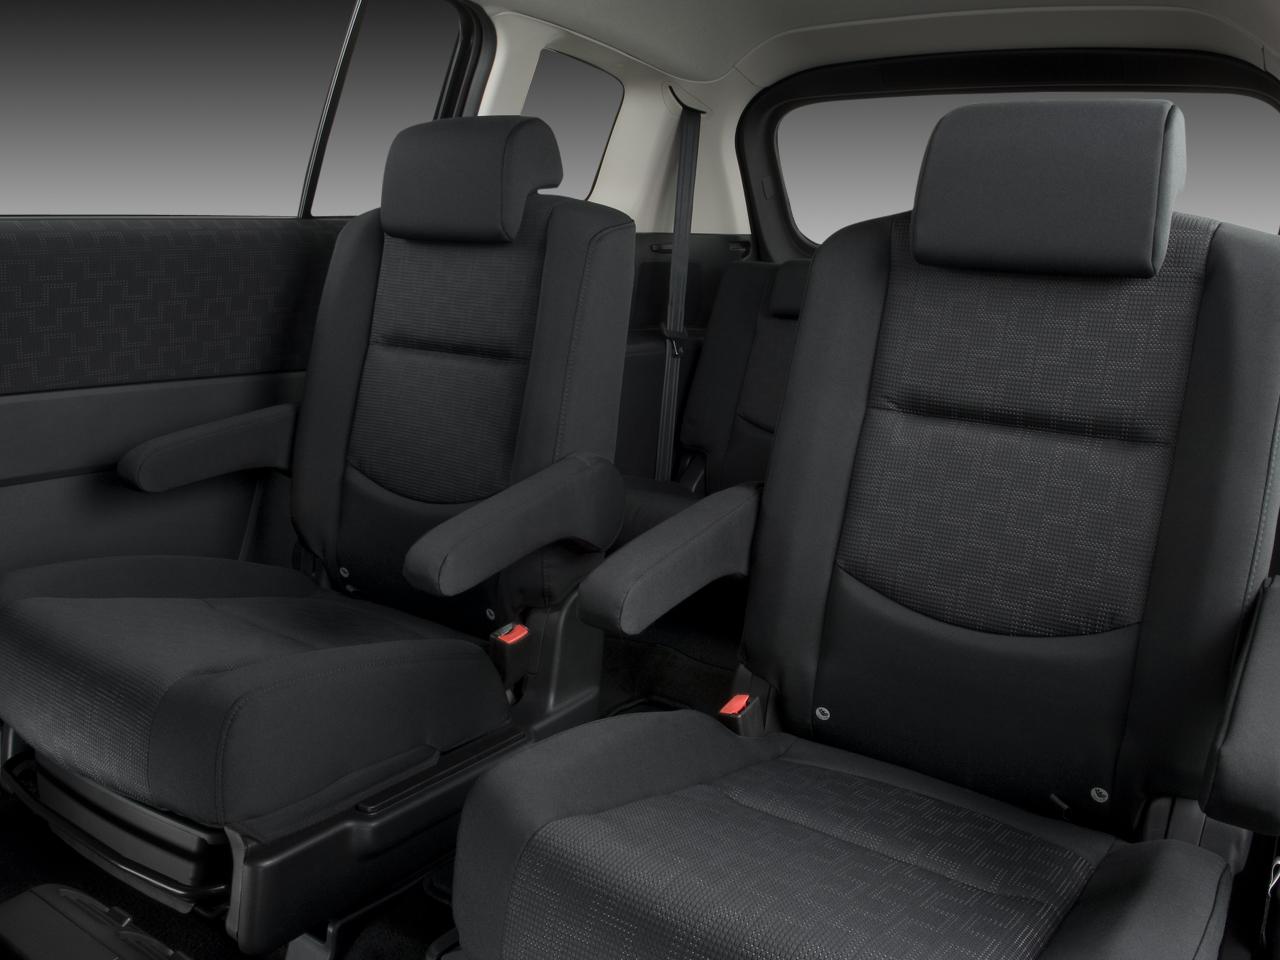 2008 mazda 5 touring mazda passenger minivan review automobile magazine. Black Bedroom Furniture Sets. Home Design Ideas